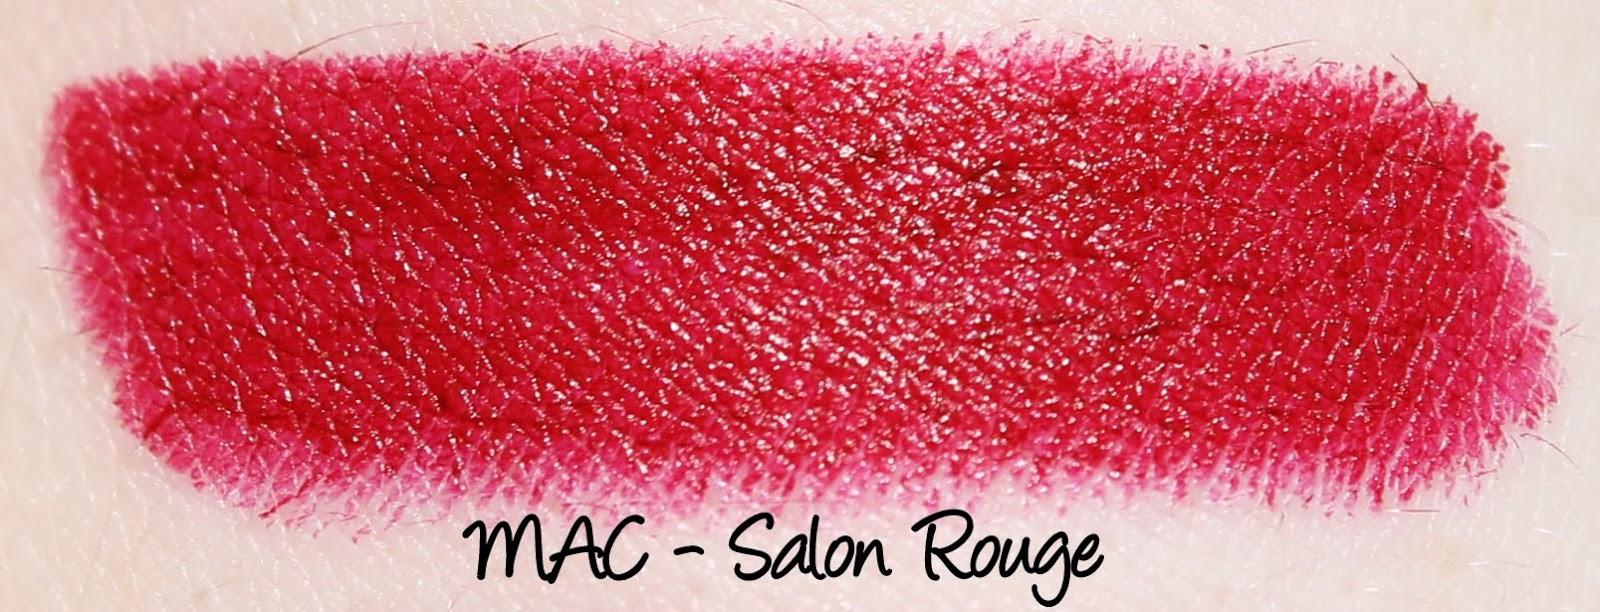 MAC Heirloom Mix Lipsticks - Salon Rouge Swatches & Review